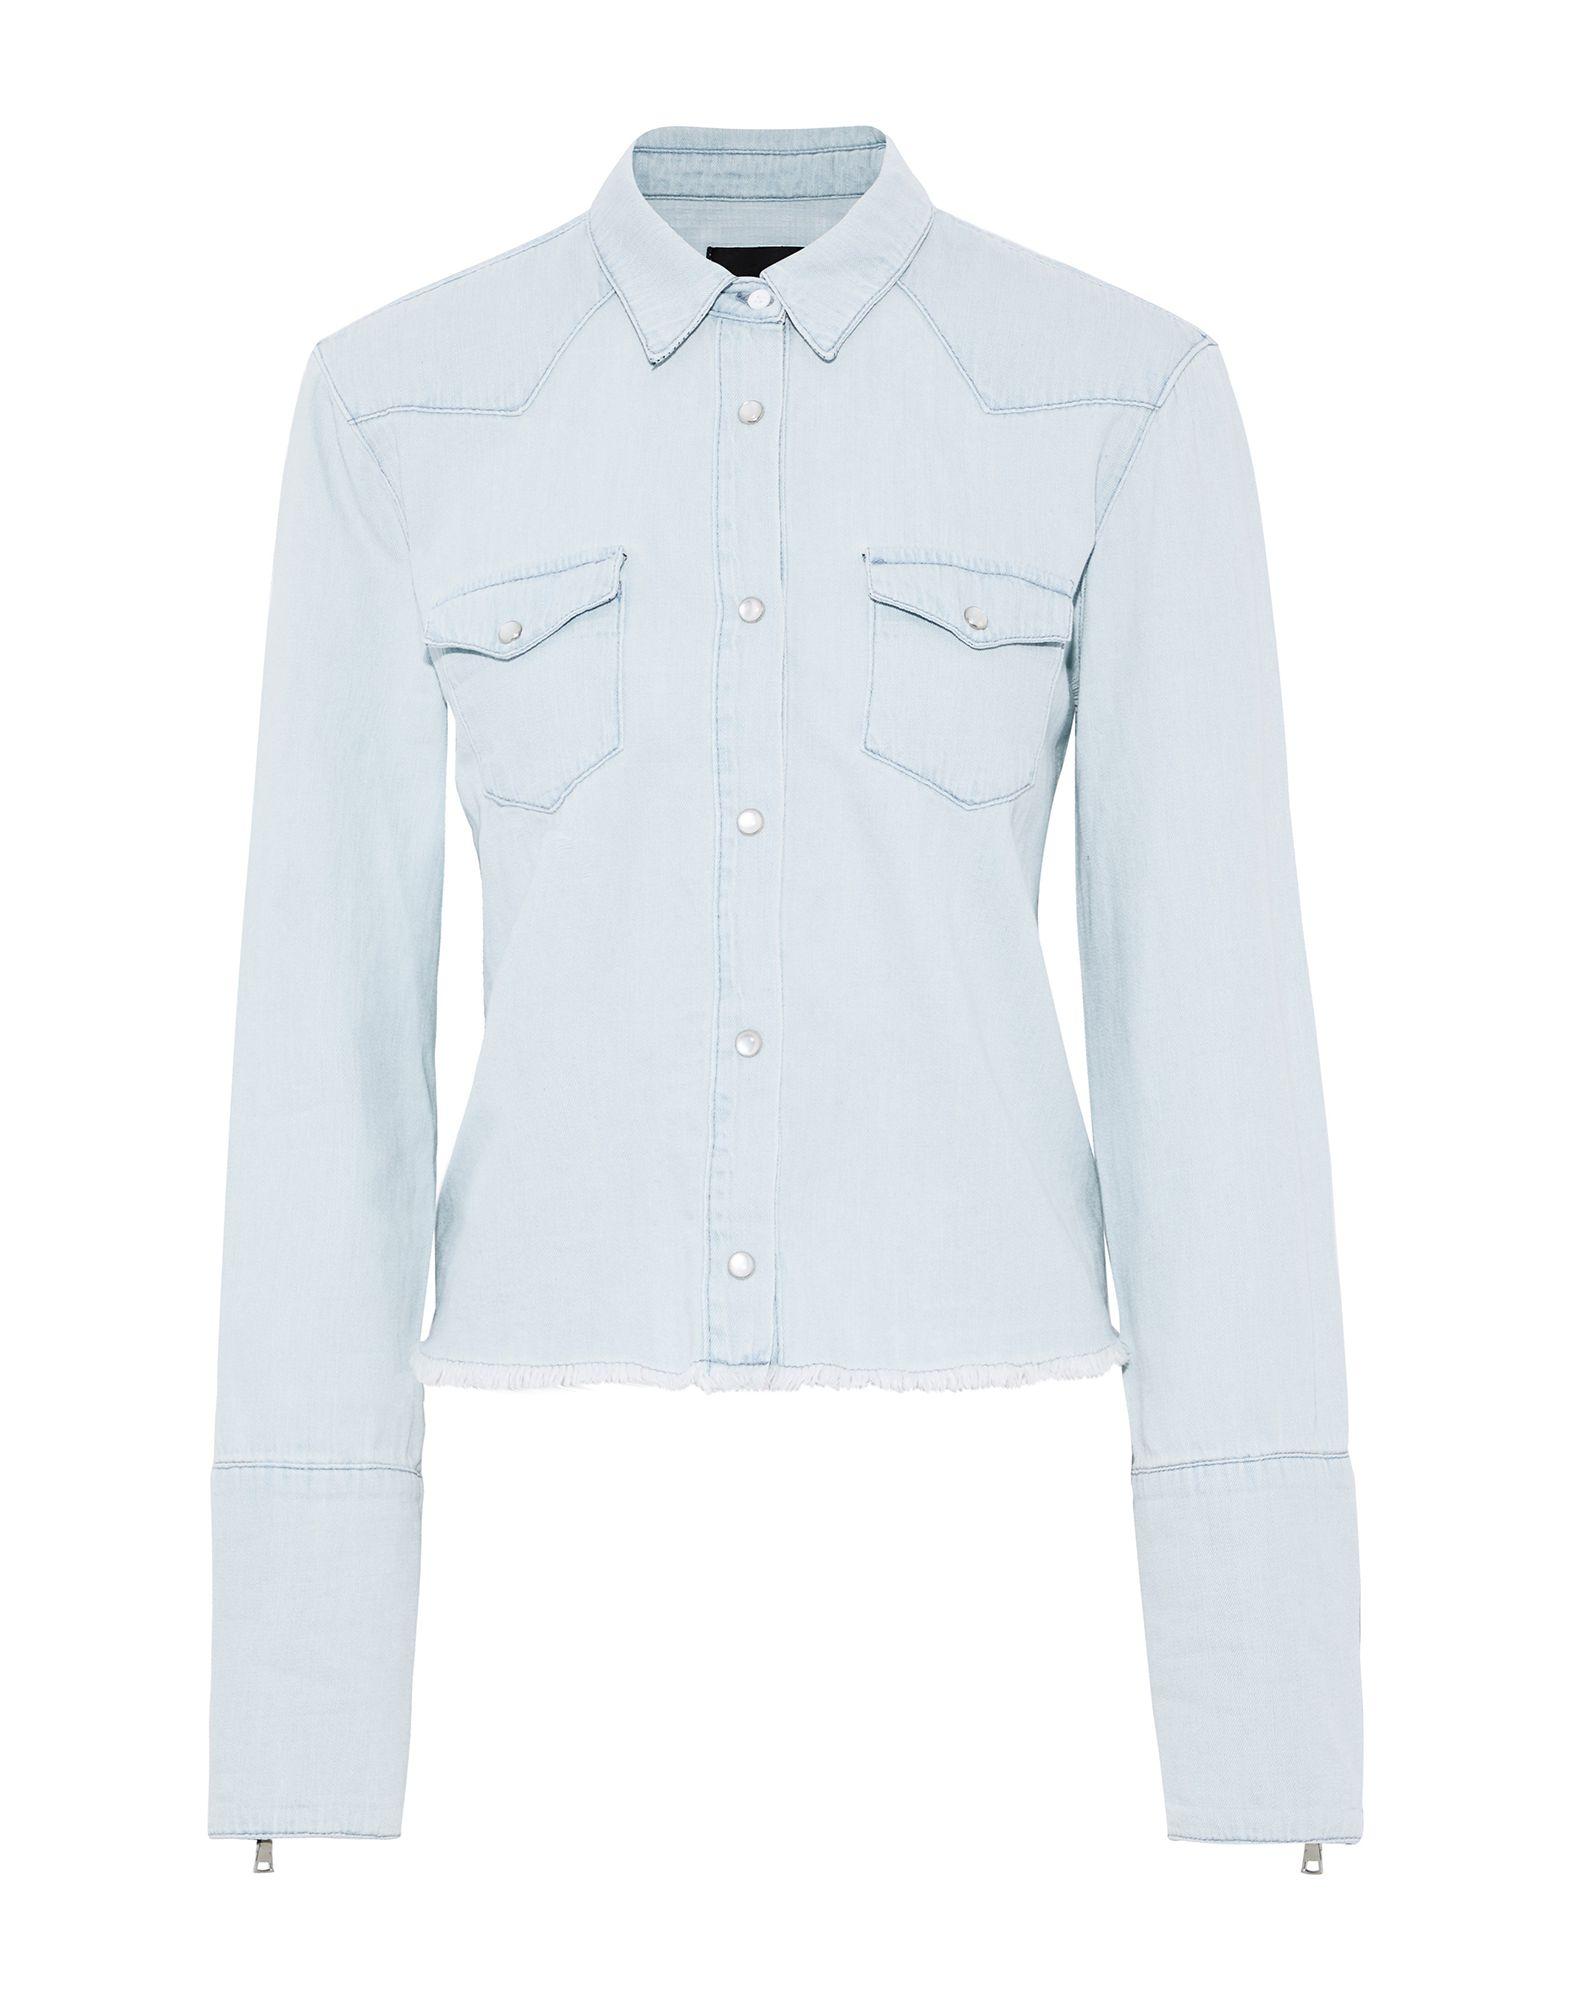 Фото - RTA Джинсовая верхняя одежда wesc джинсовая верхняя одежда